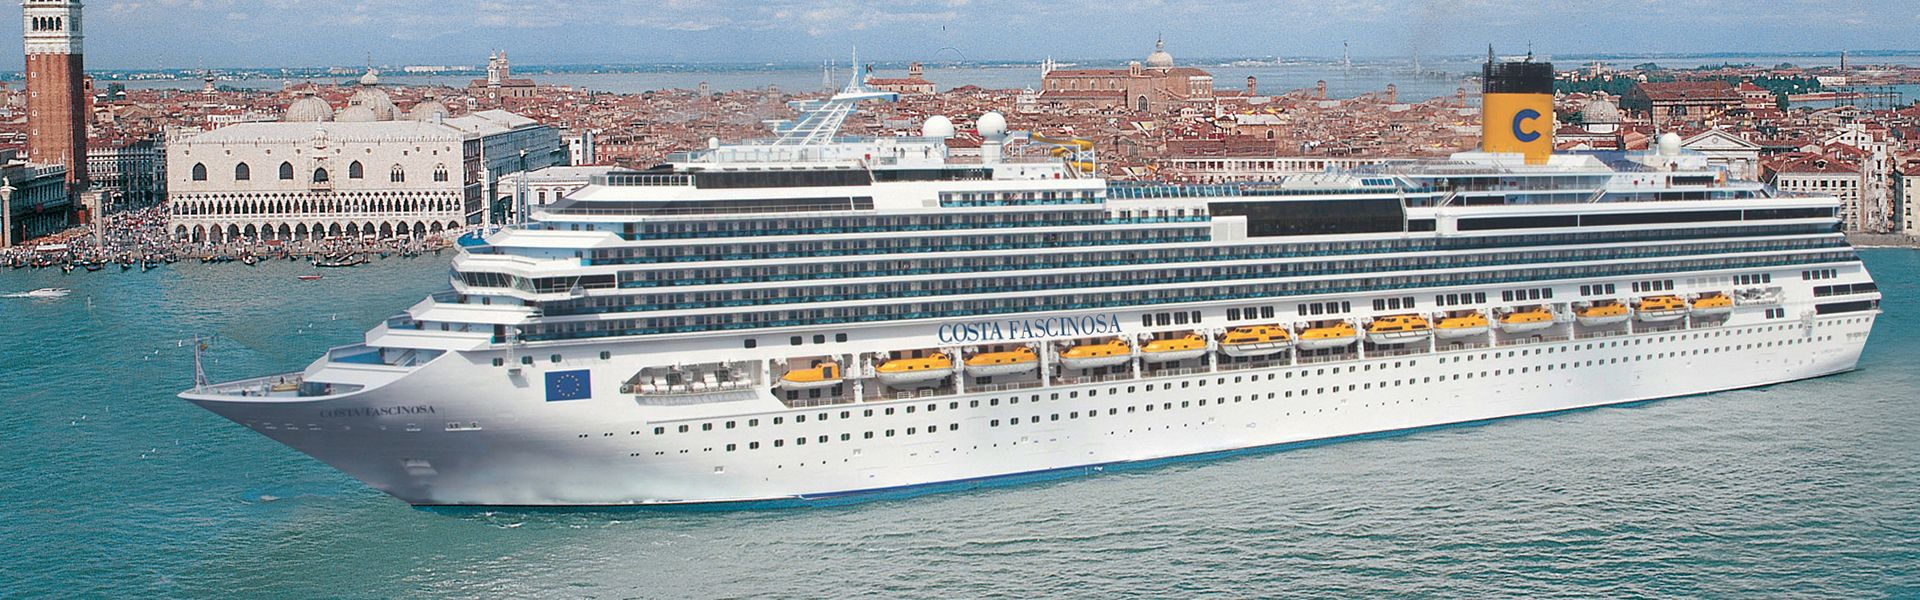 Croaziera 2017 - Mediterana de Vest (Savona) - Costa Cruises - Costa Fascinosa - 7 nopti